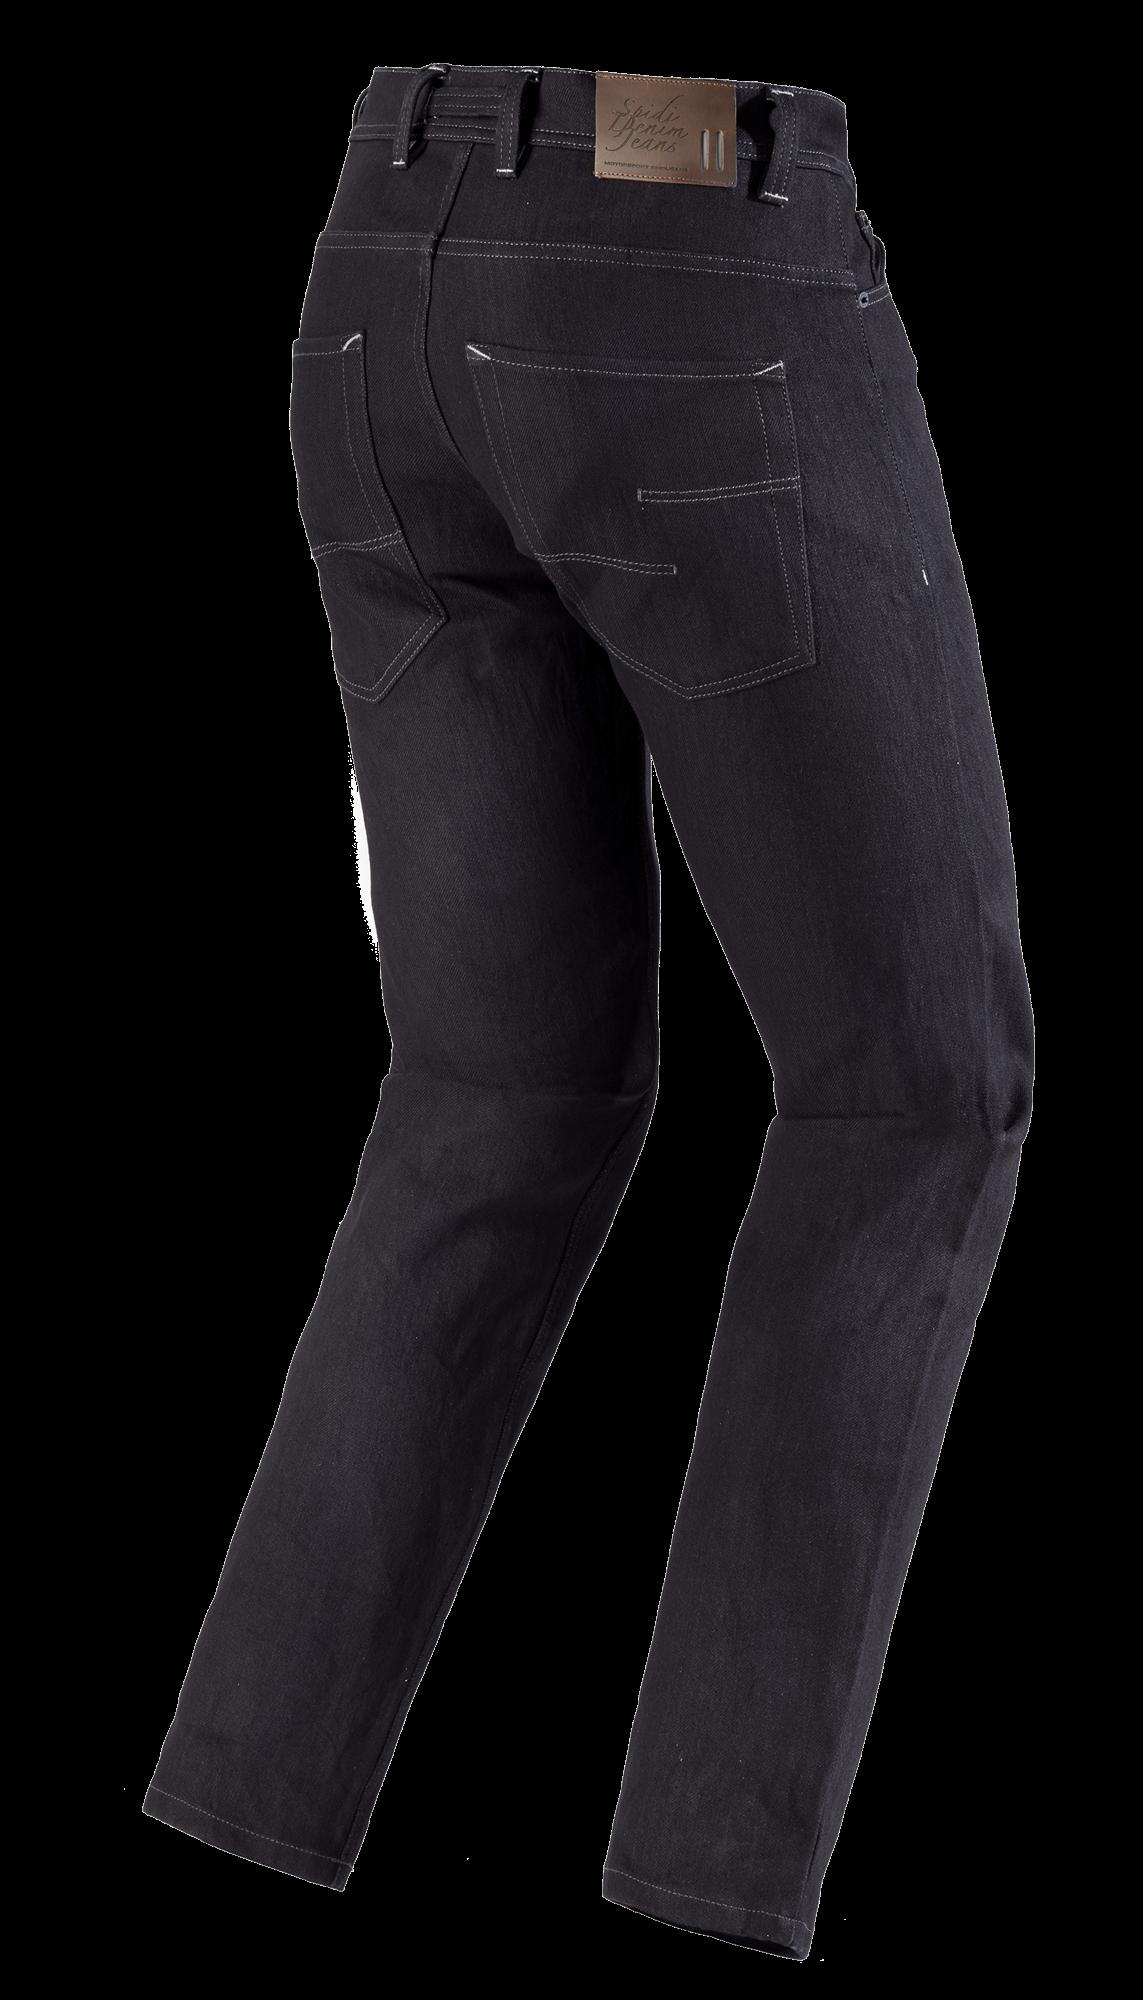 J&Dyneema Denim Jeans Pants.